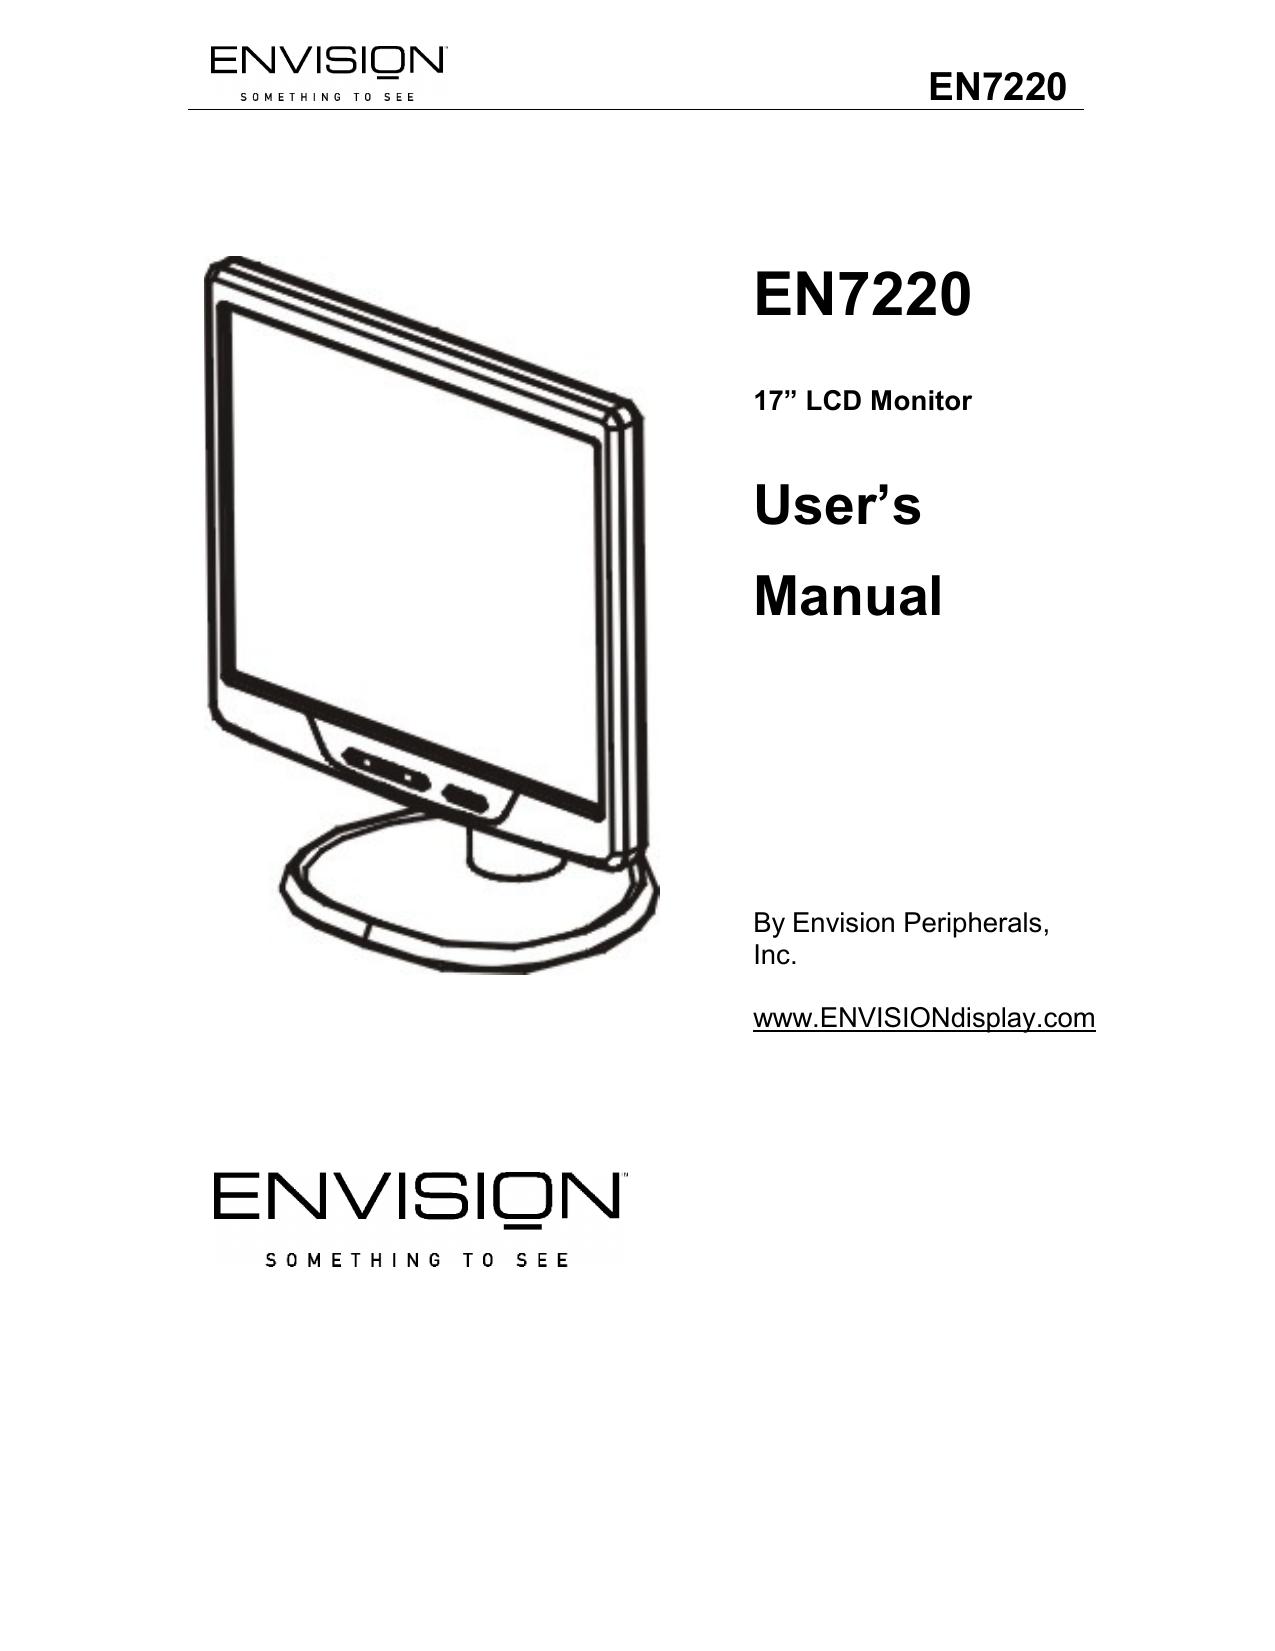 Envision Peripherals Computer Monitor EN7220 User manual